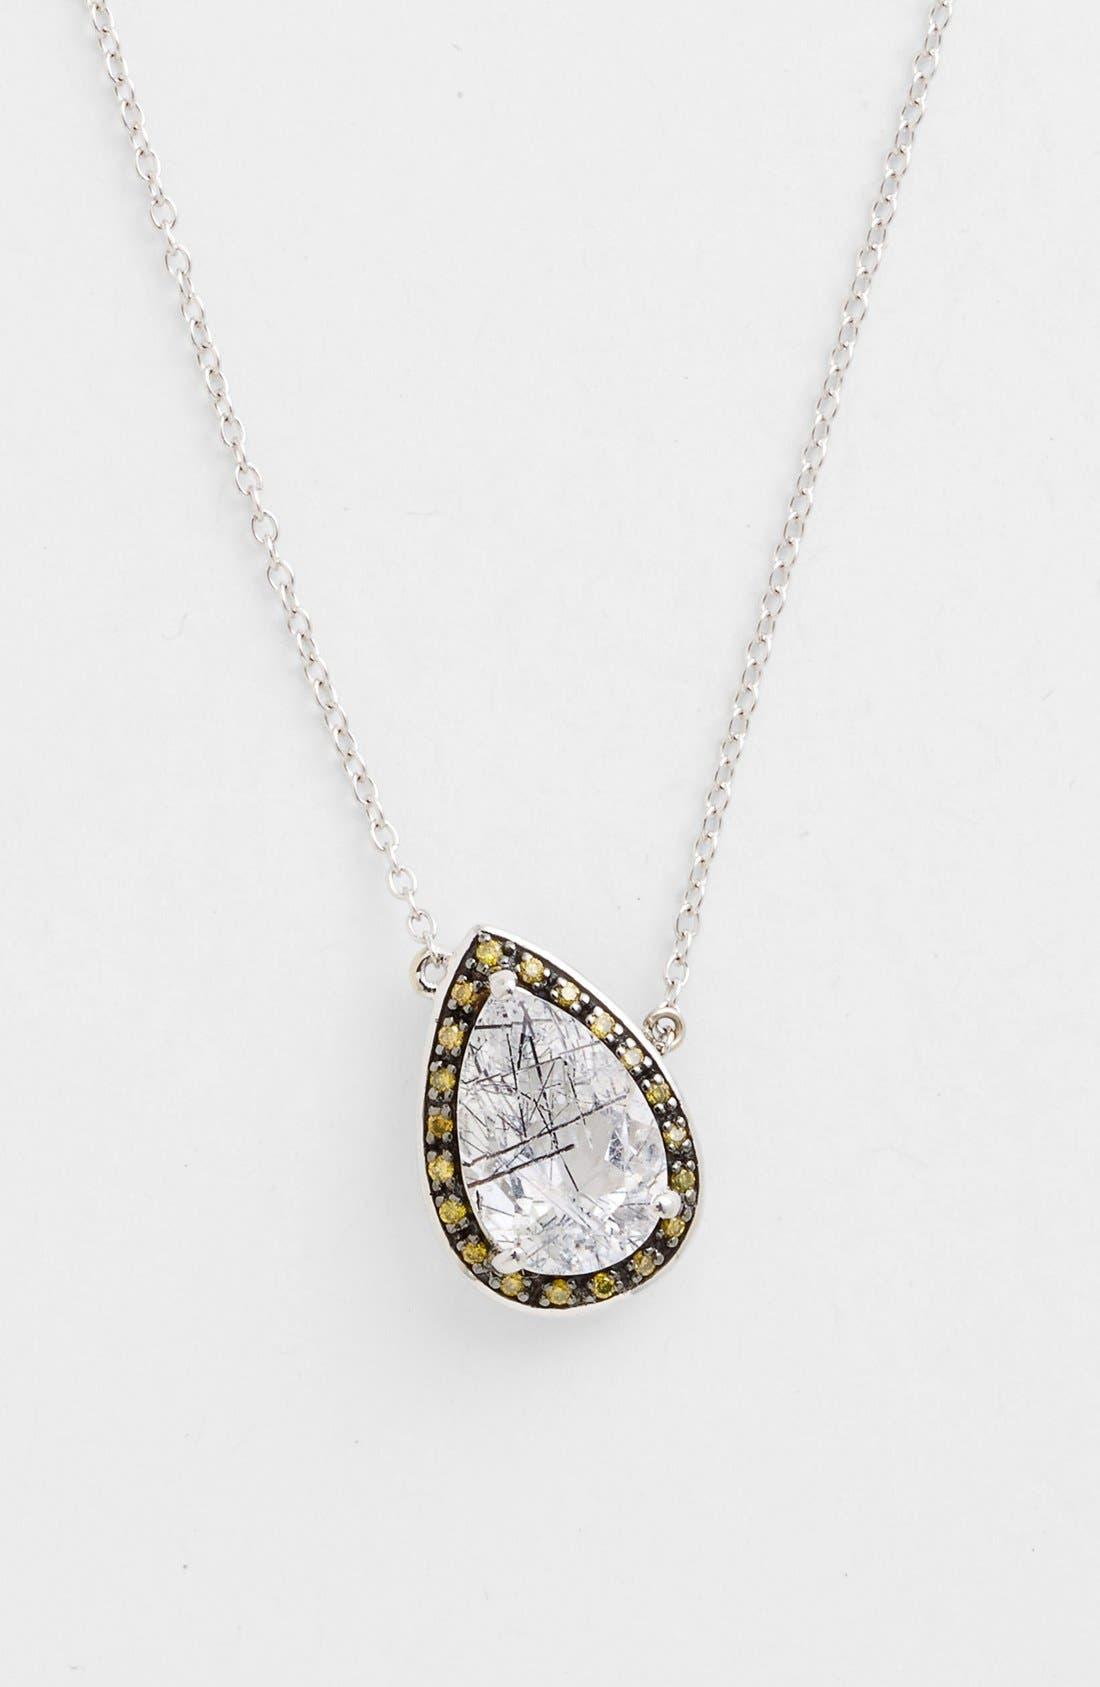 Main Image - Whitney Stern Quartz & Canary Diamond Pendant Necklace